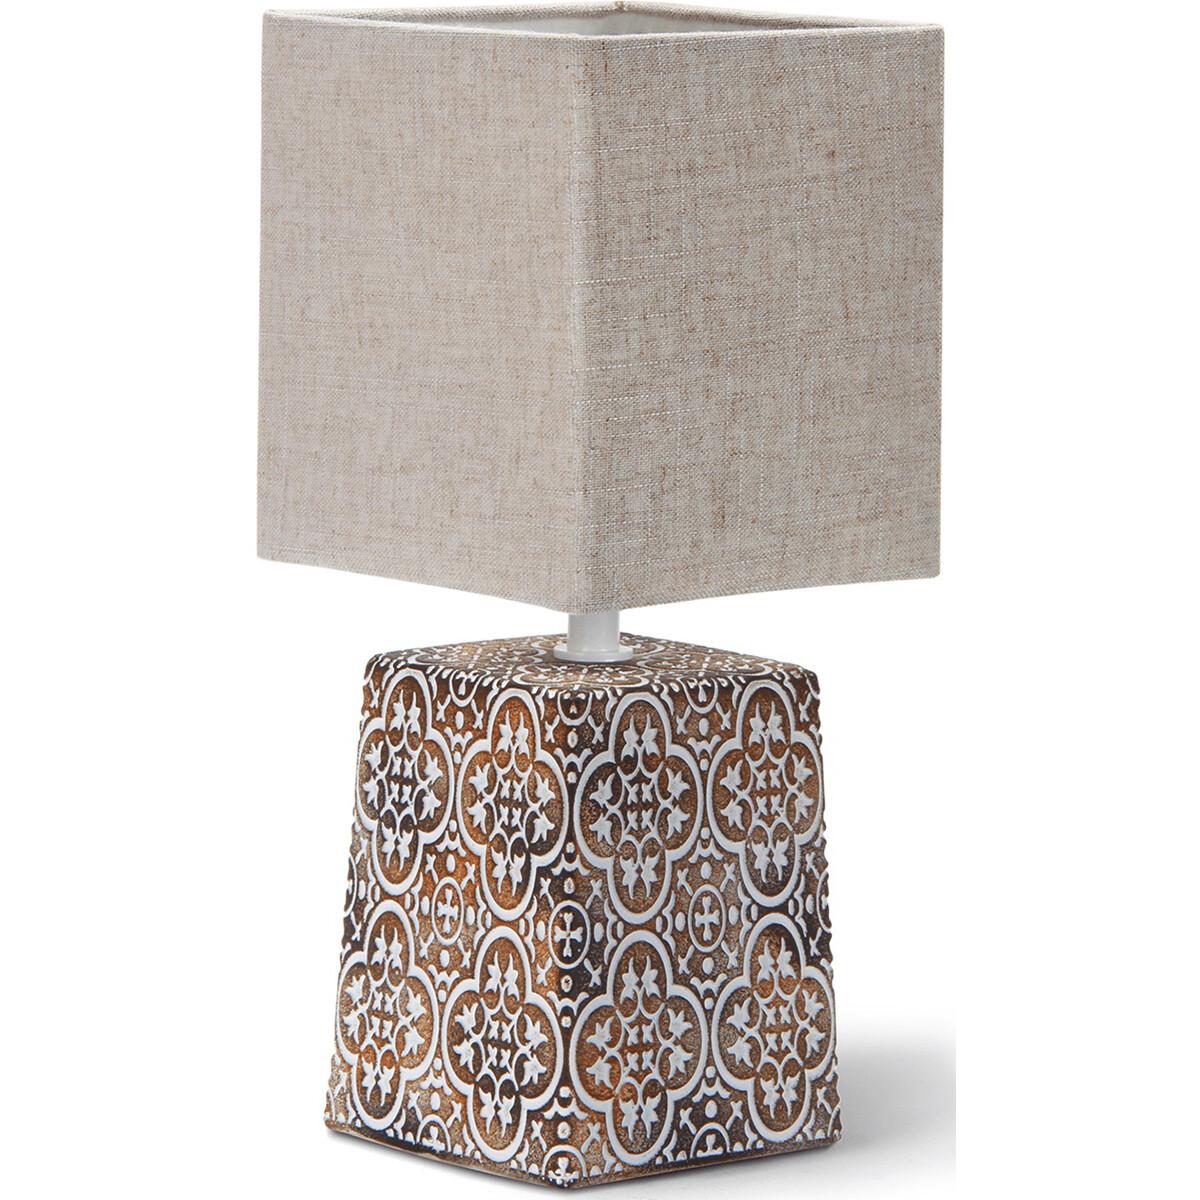 LED Tafellamp - Tafelverlichting - Aigi Doni - E14 Fitting - Vierkant - Mat Bruin - Keramiek